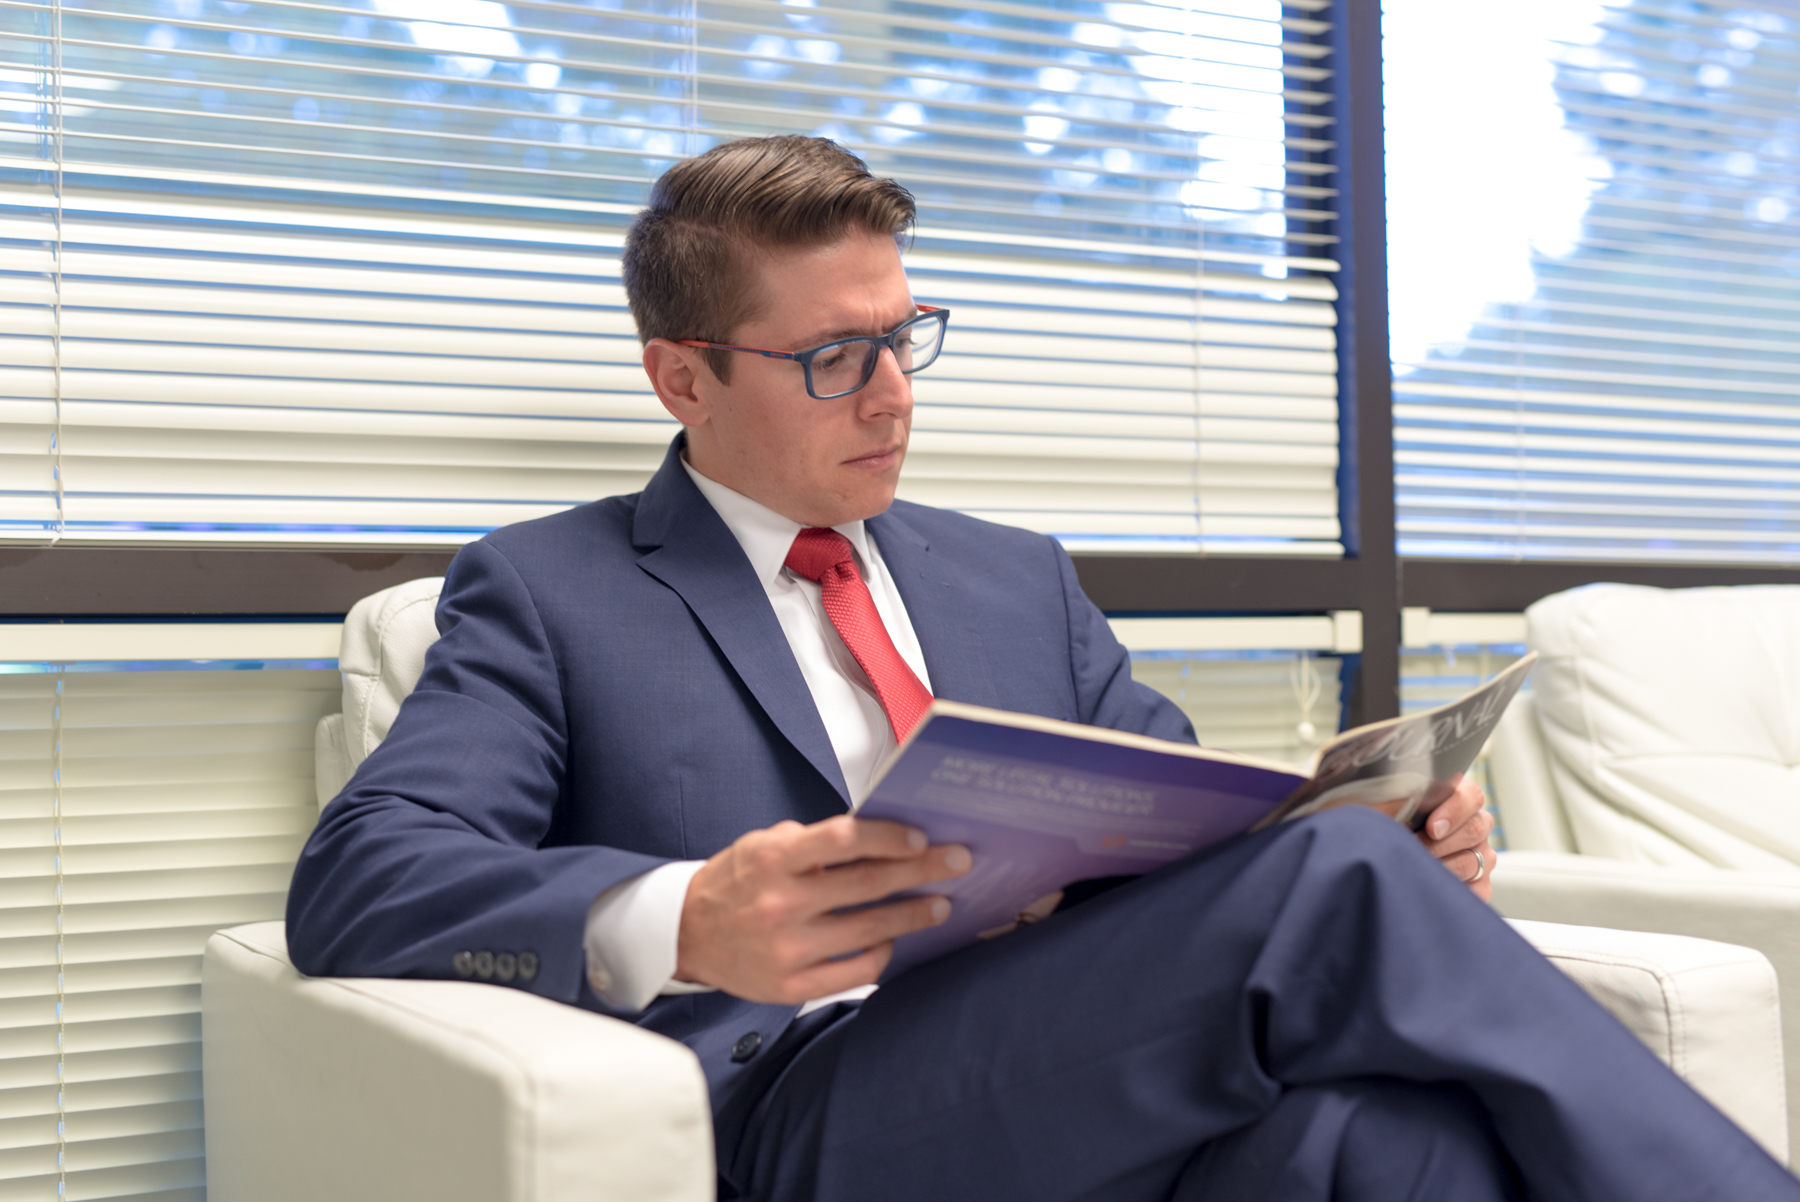 business corporate portrait profile lifestyle.jpg